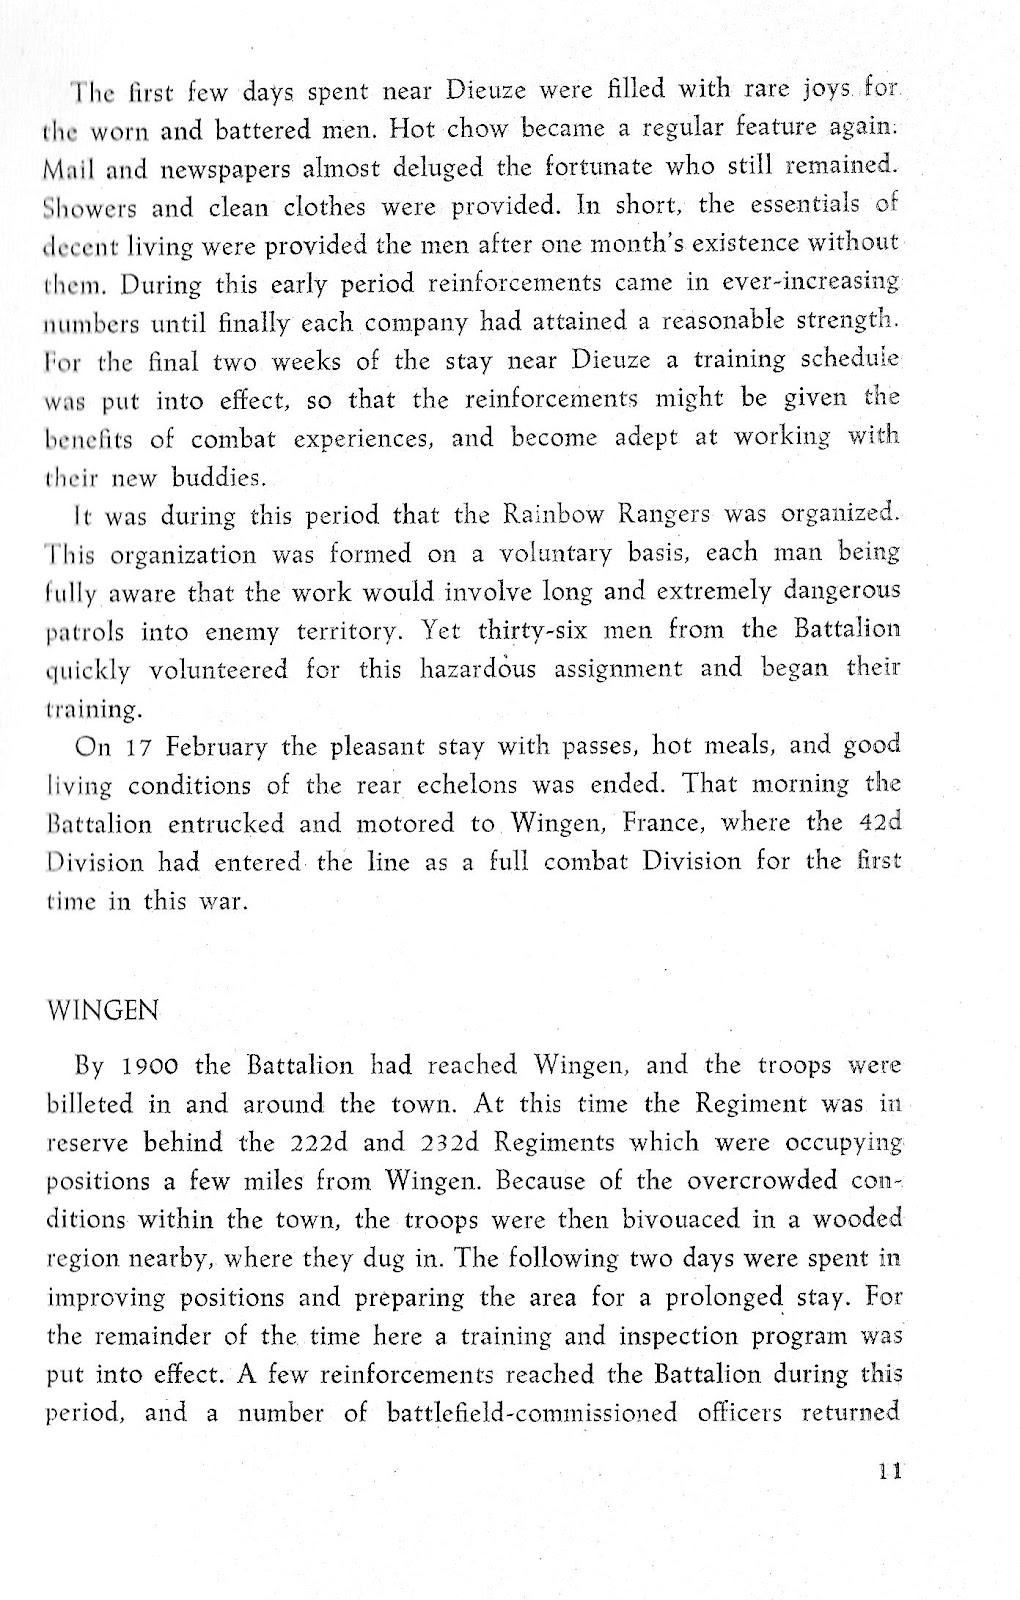 History pg11.jpg